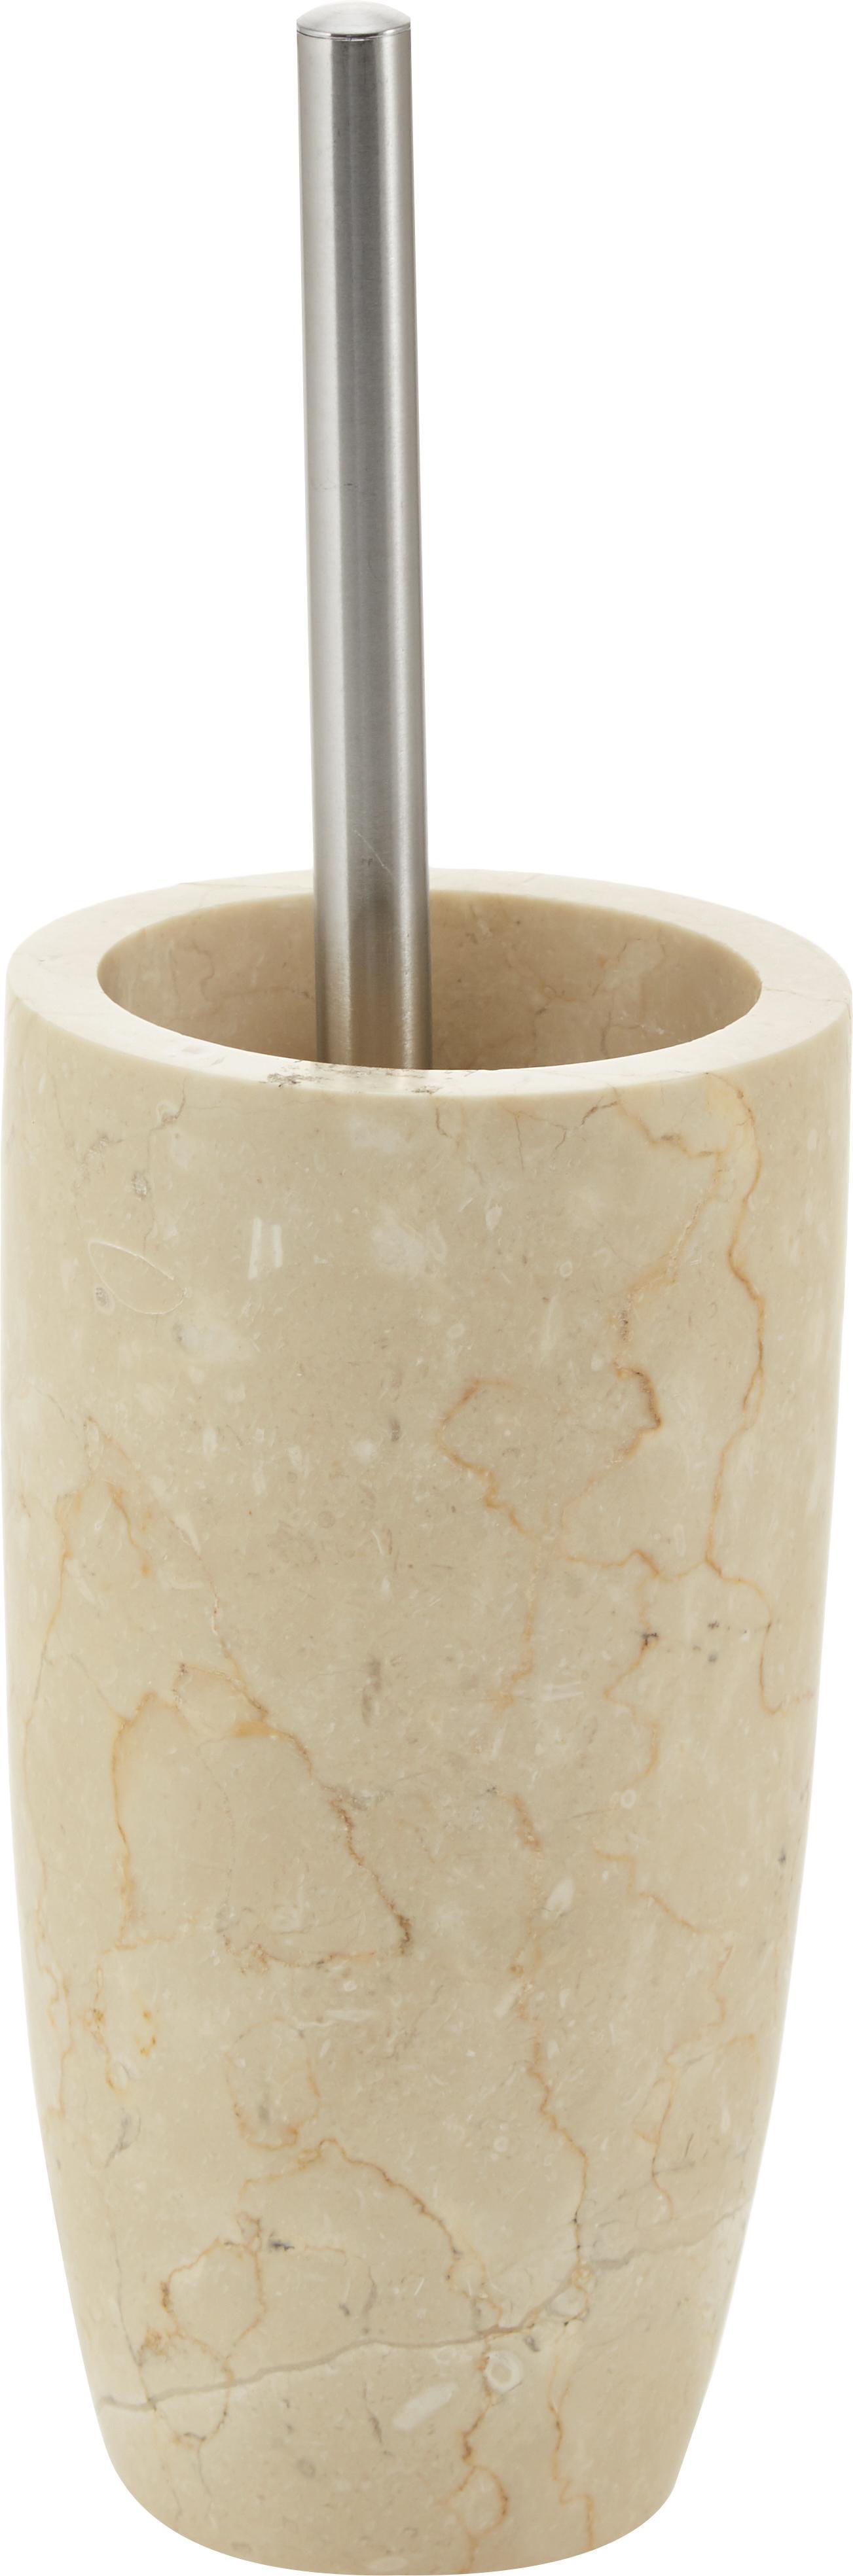 Marmeren toiletborstel Luxor, Houder: marmer, Beige, staalkleurig, Ø 11 x H 36 cm